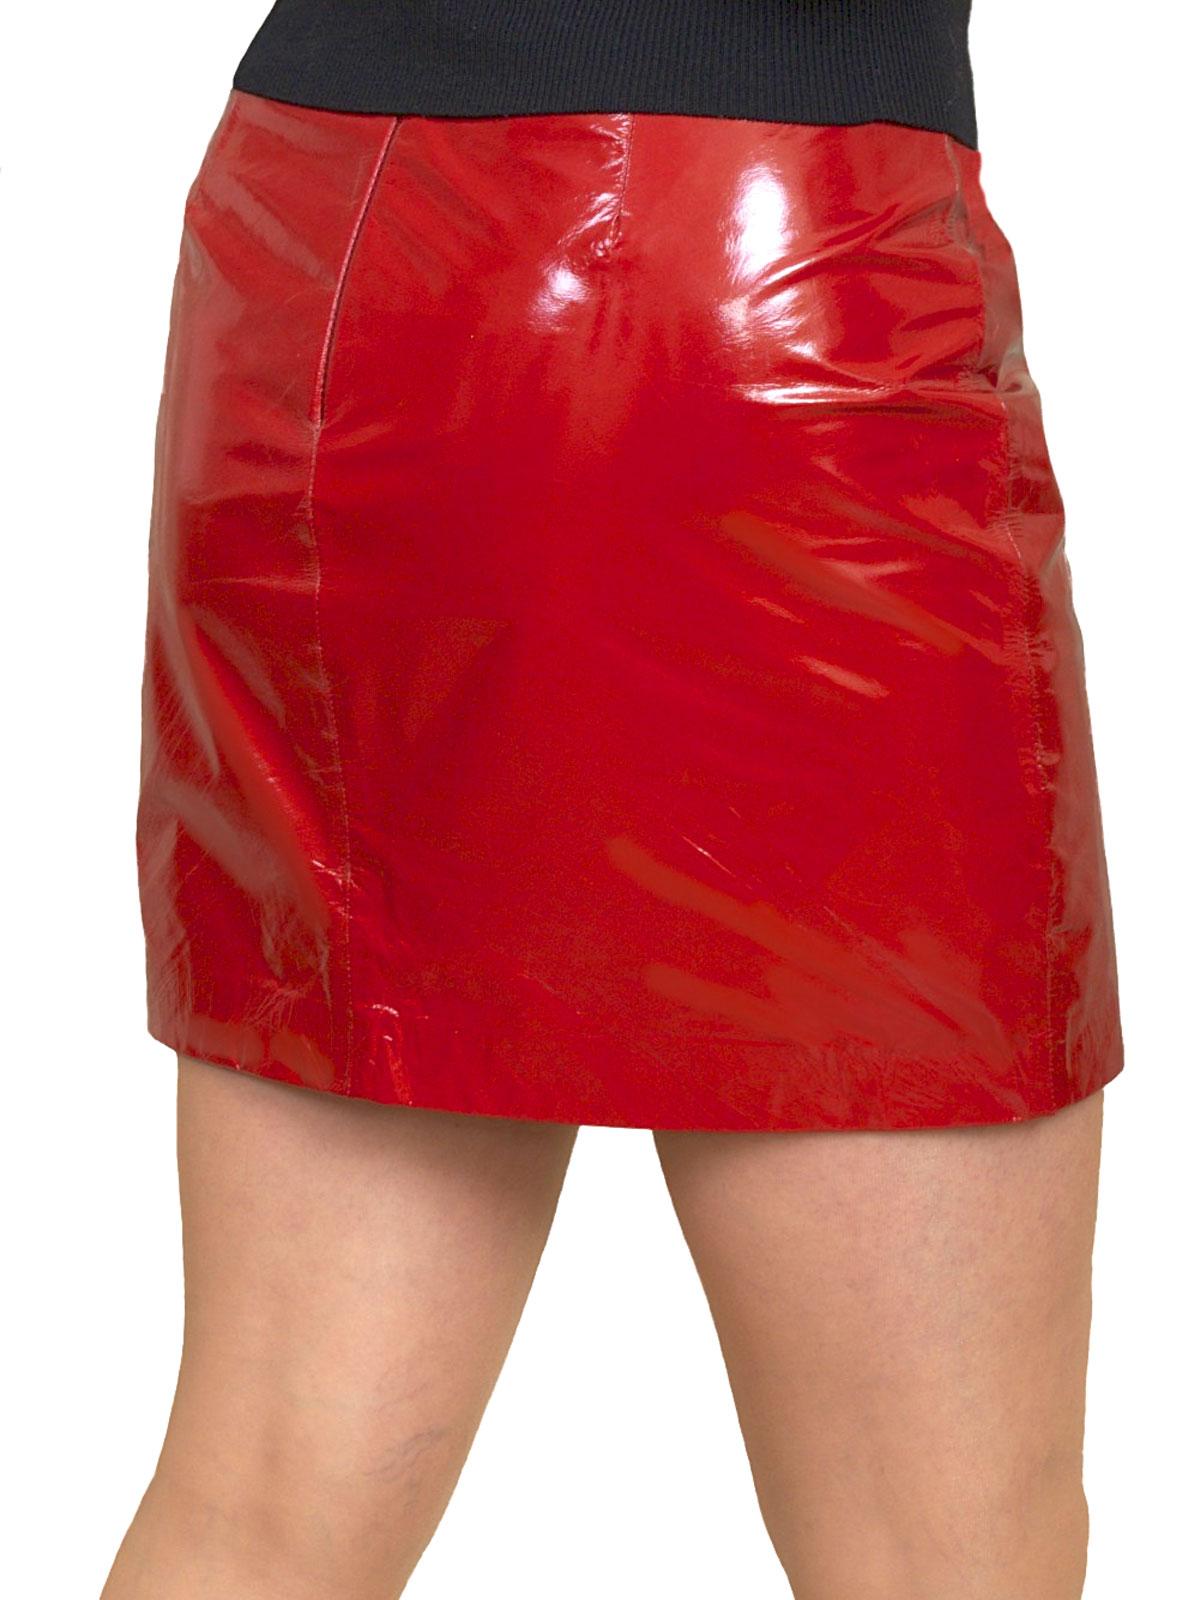 Patent Leather Mini Skirt (Red or White) - Tout Ensemble